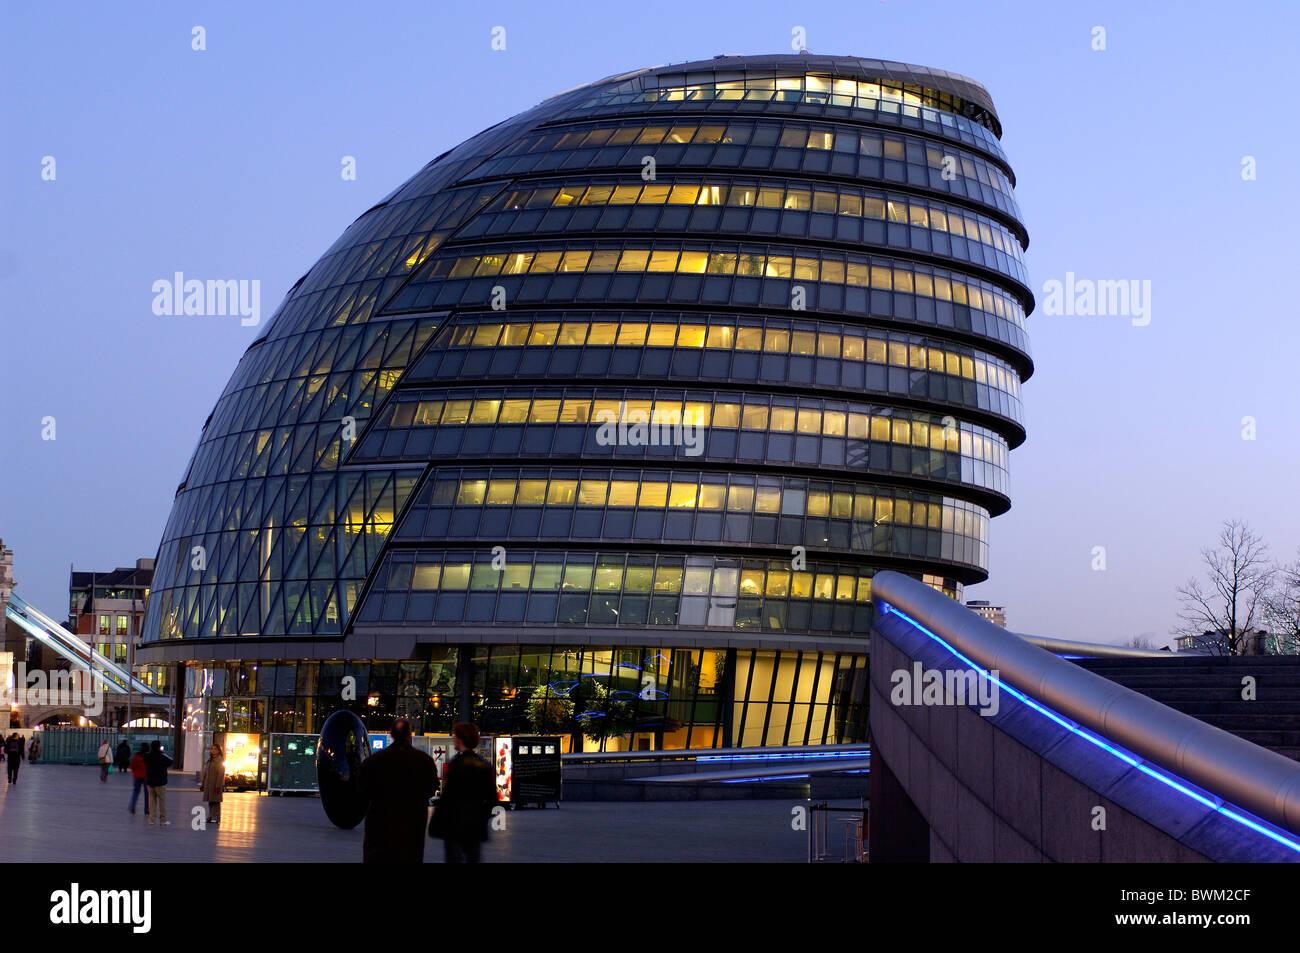 UK London City Hall Greater London Authority Great Britain Europe United Kingdom England Europe Architecture - Stock Image